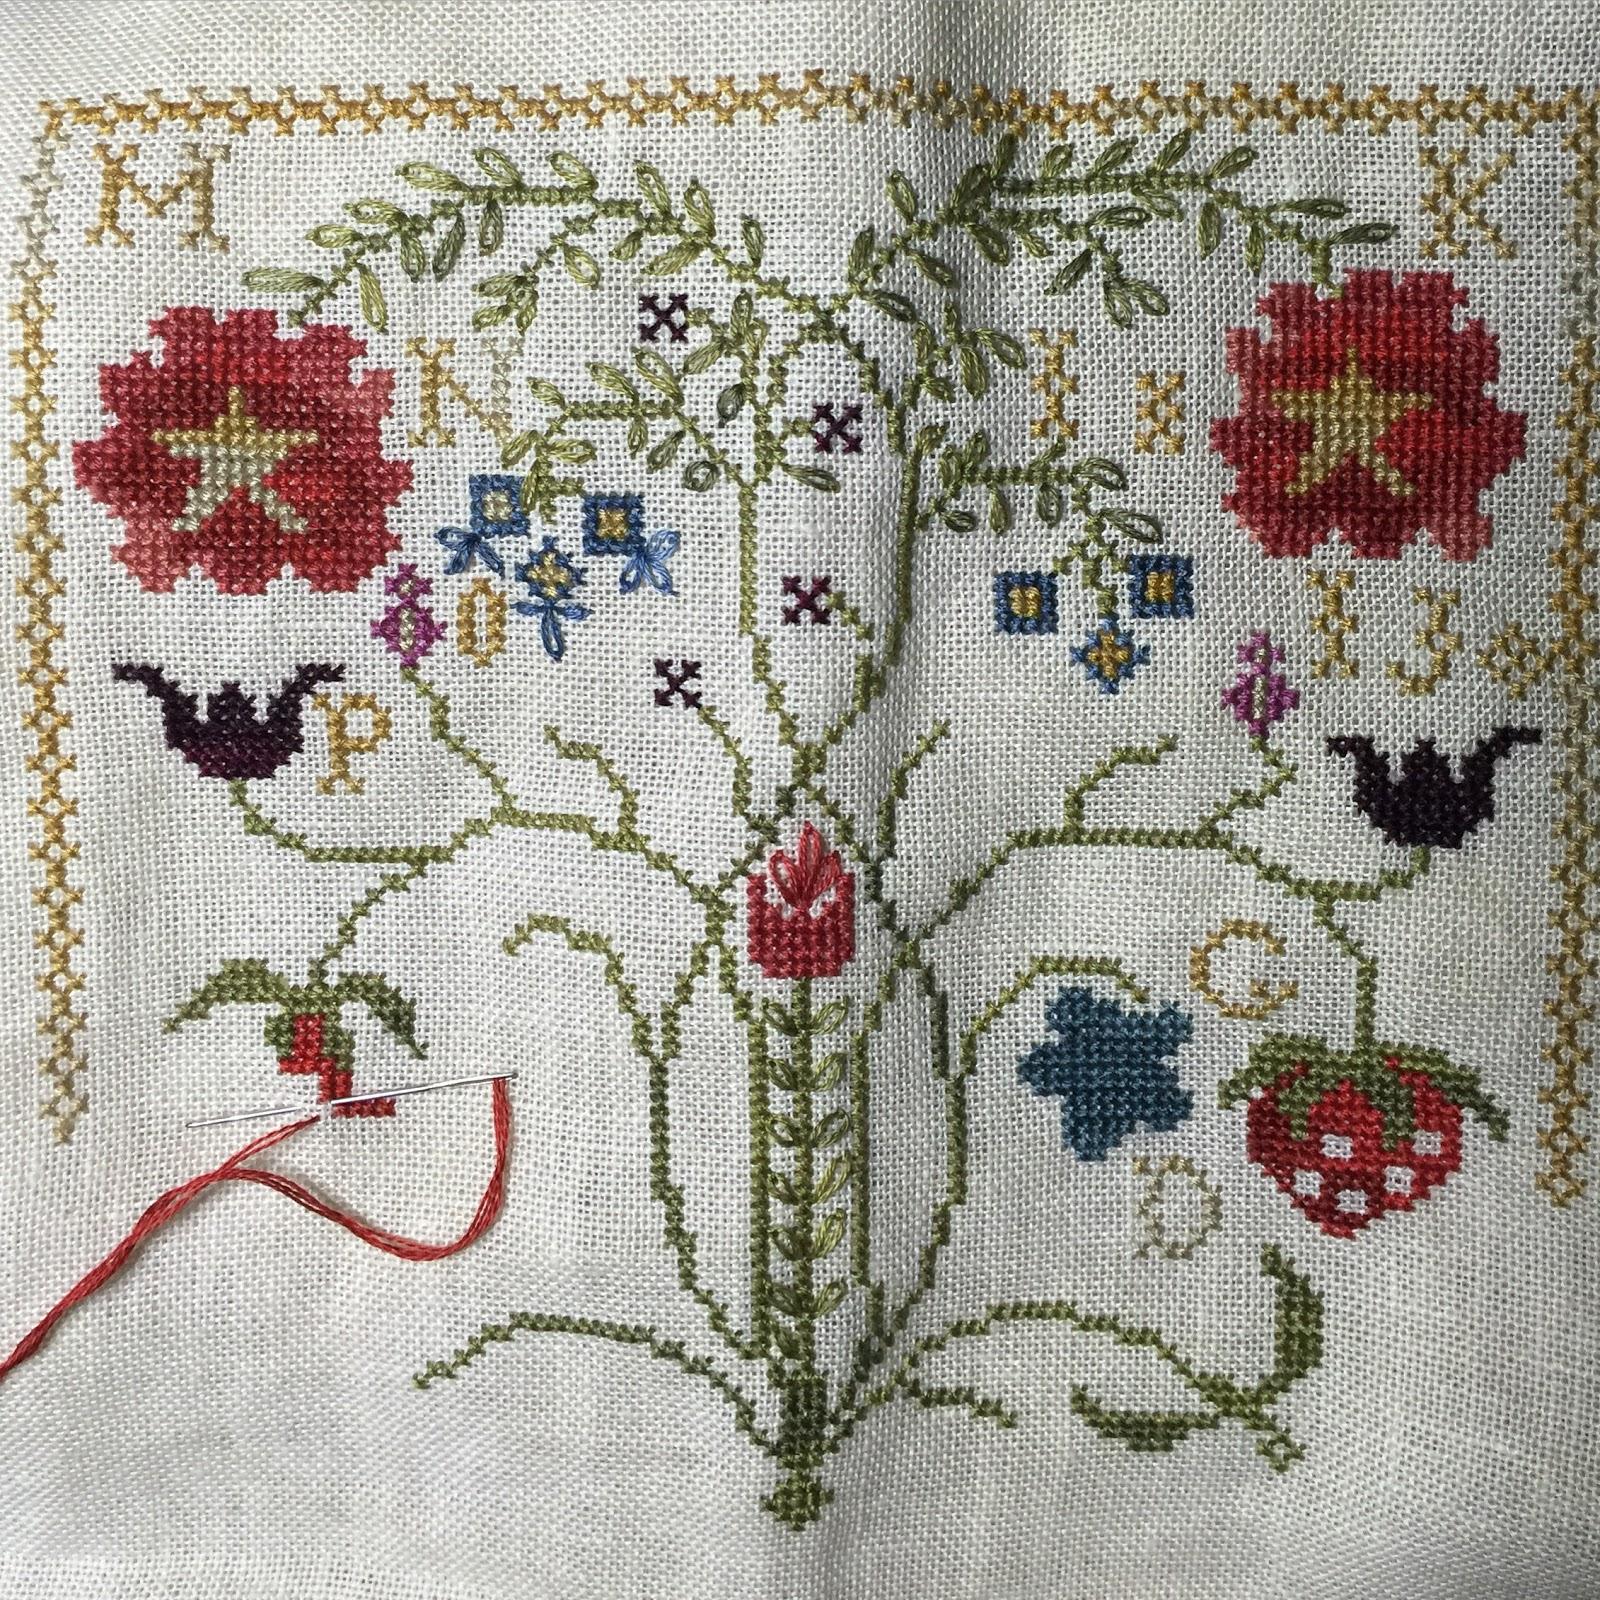 Sharon 39 s cross stitch obsession for Blackbird designs strawberry garden